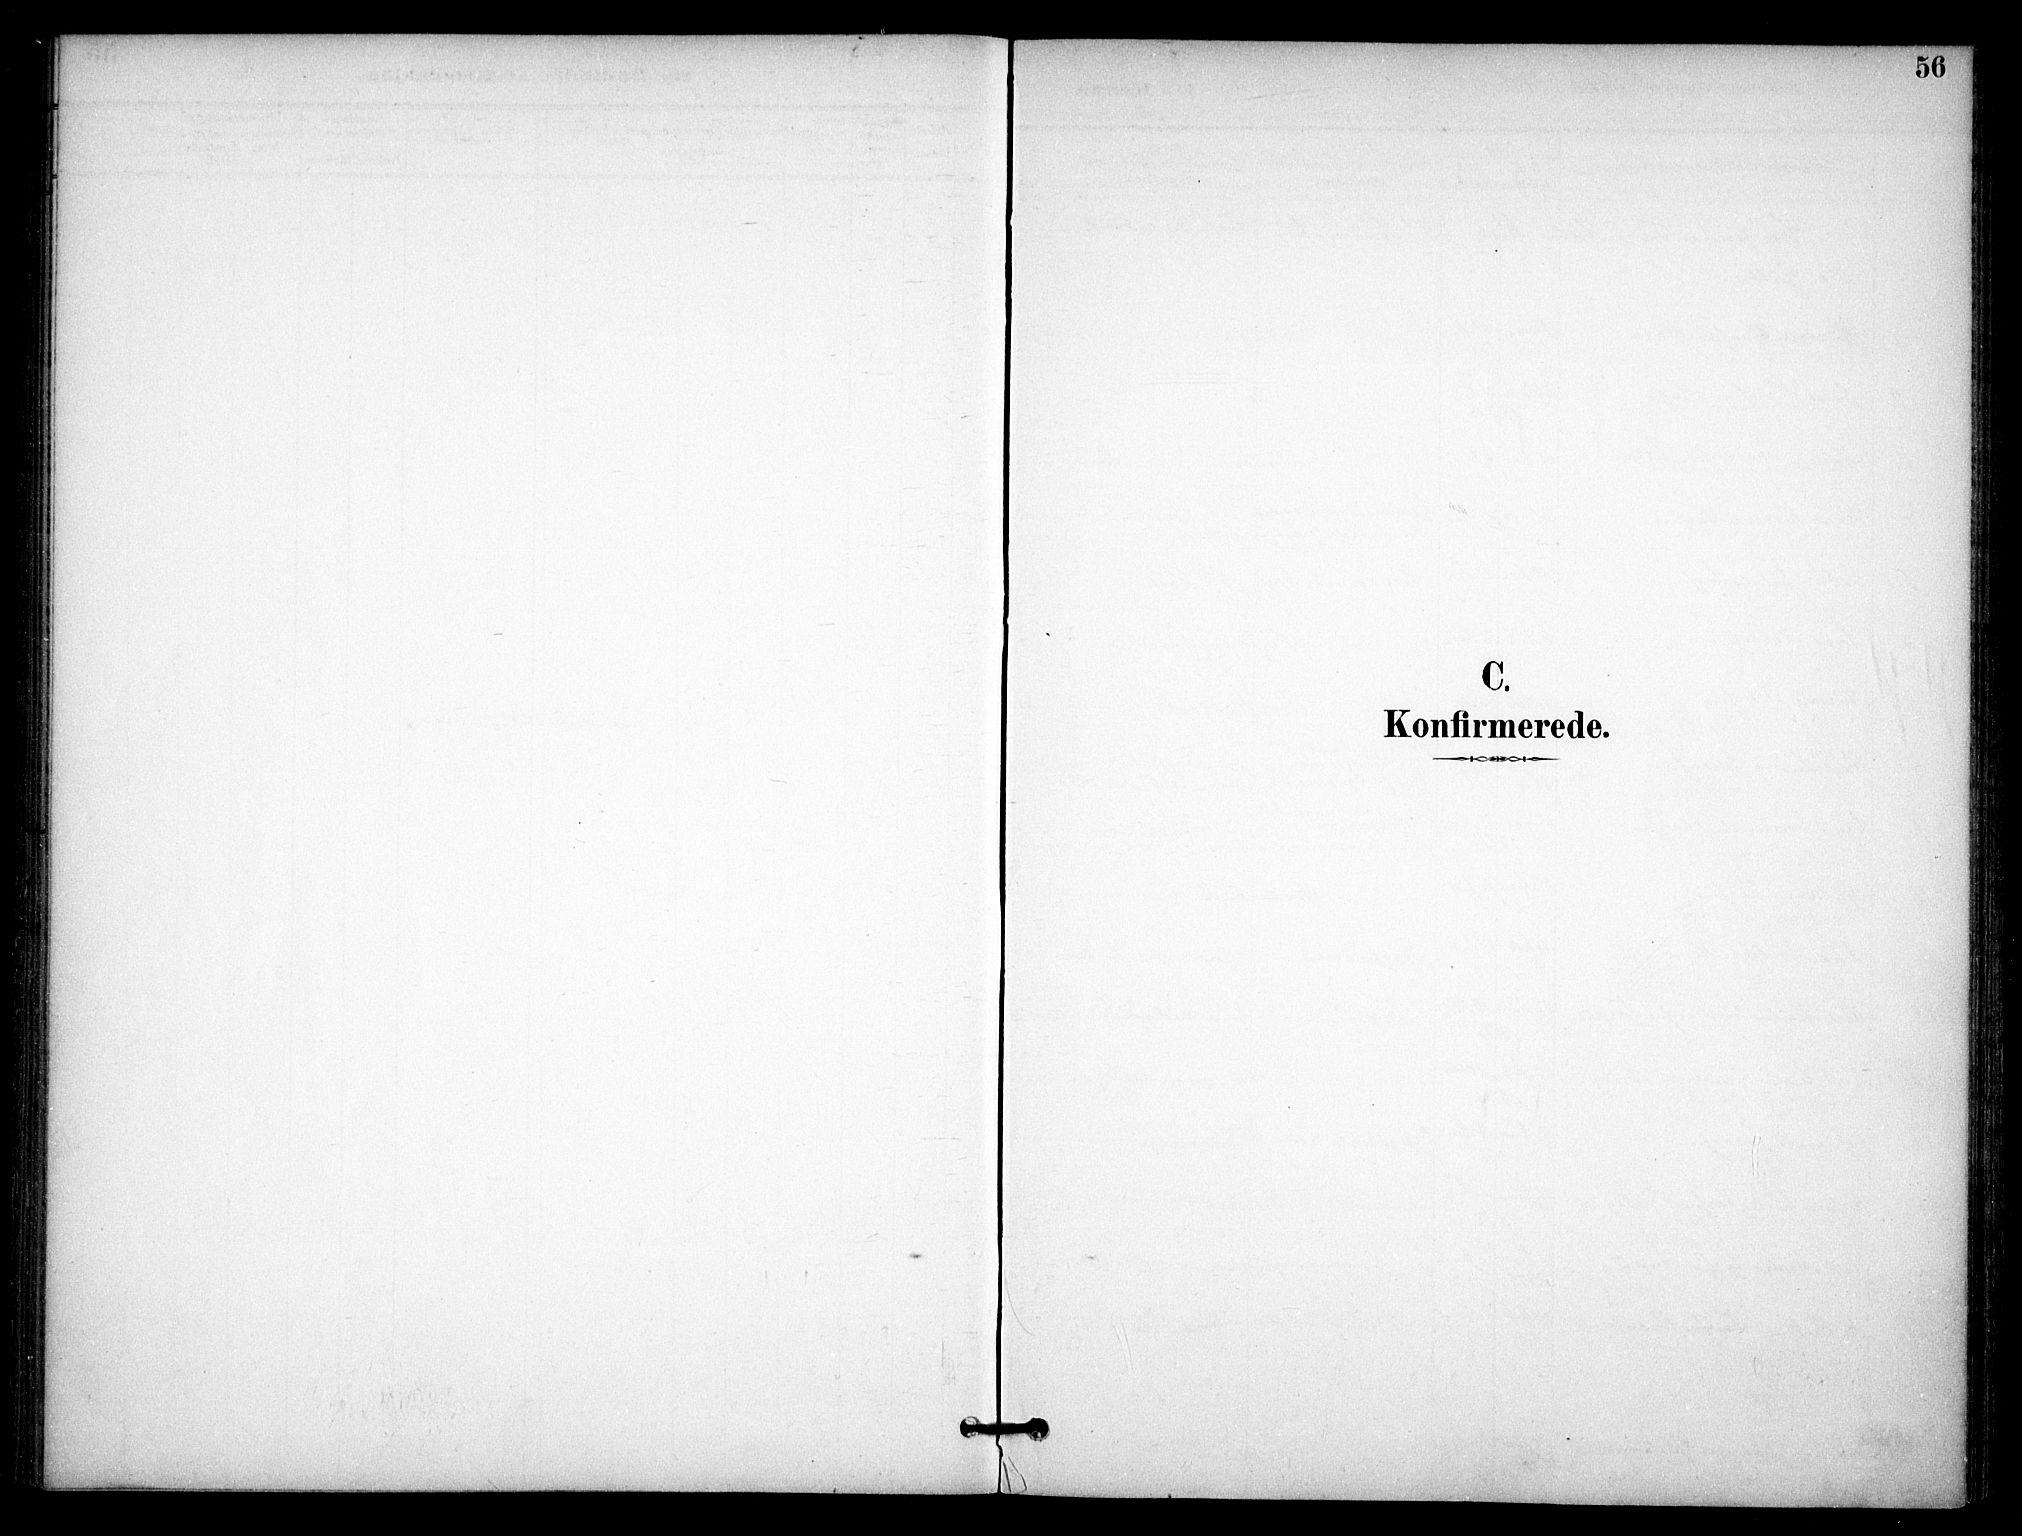 SAO, Nannestad prestekontor Kirkebøker, F/Fb/L0002: Ministerialbok nr. II 2, 1891-1909, s. 56